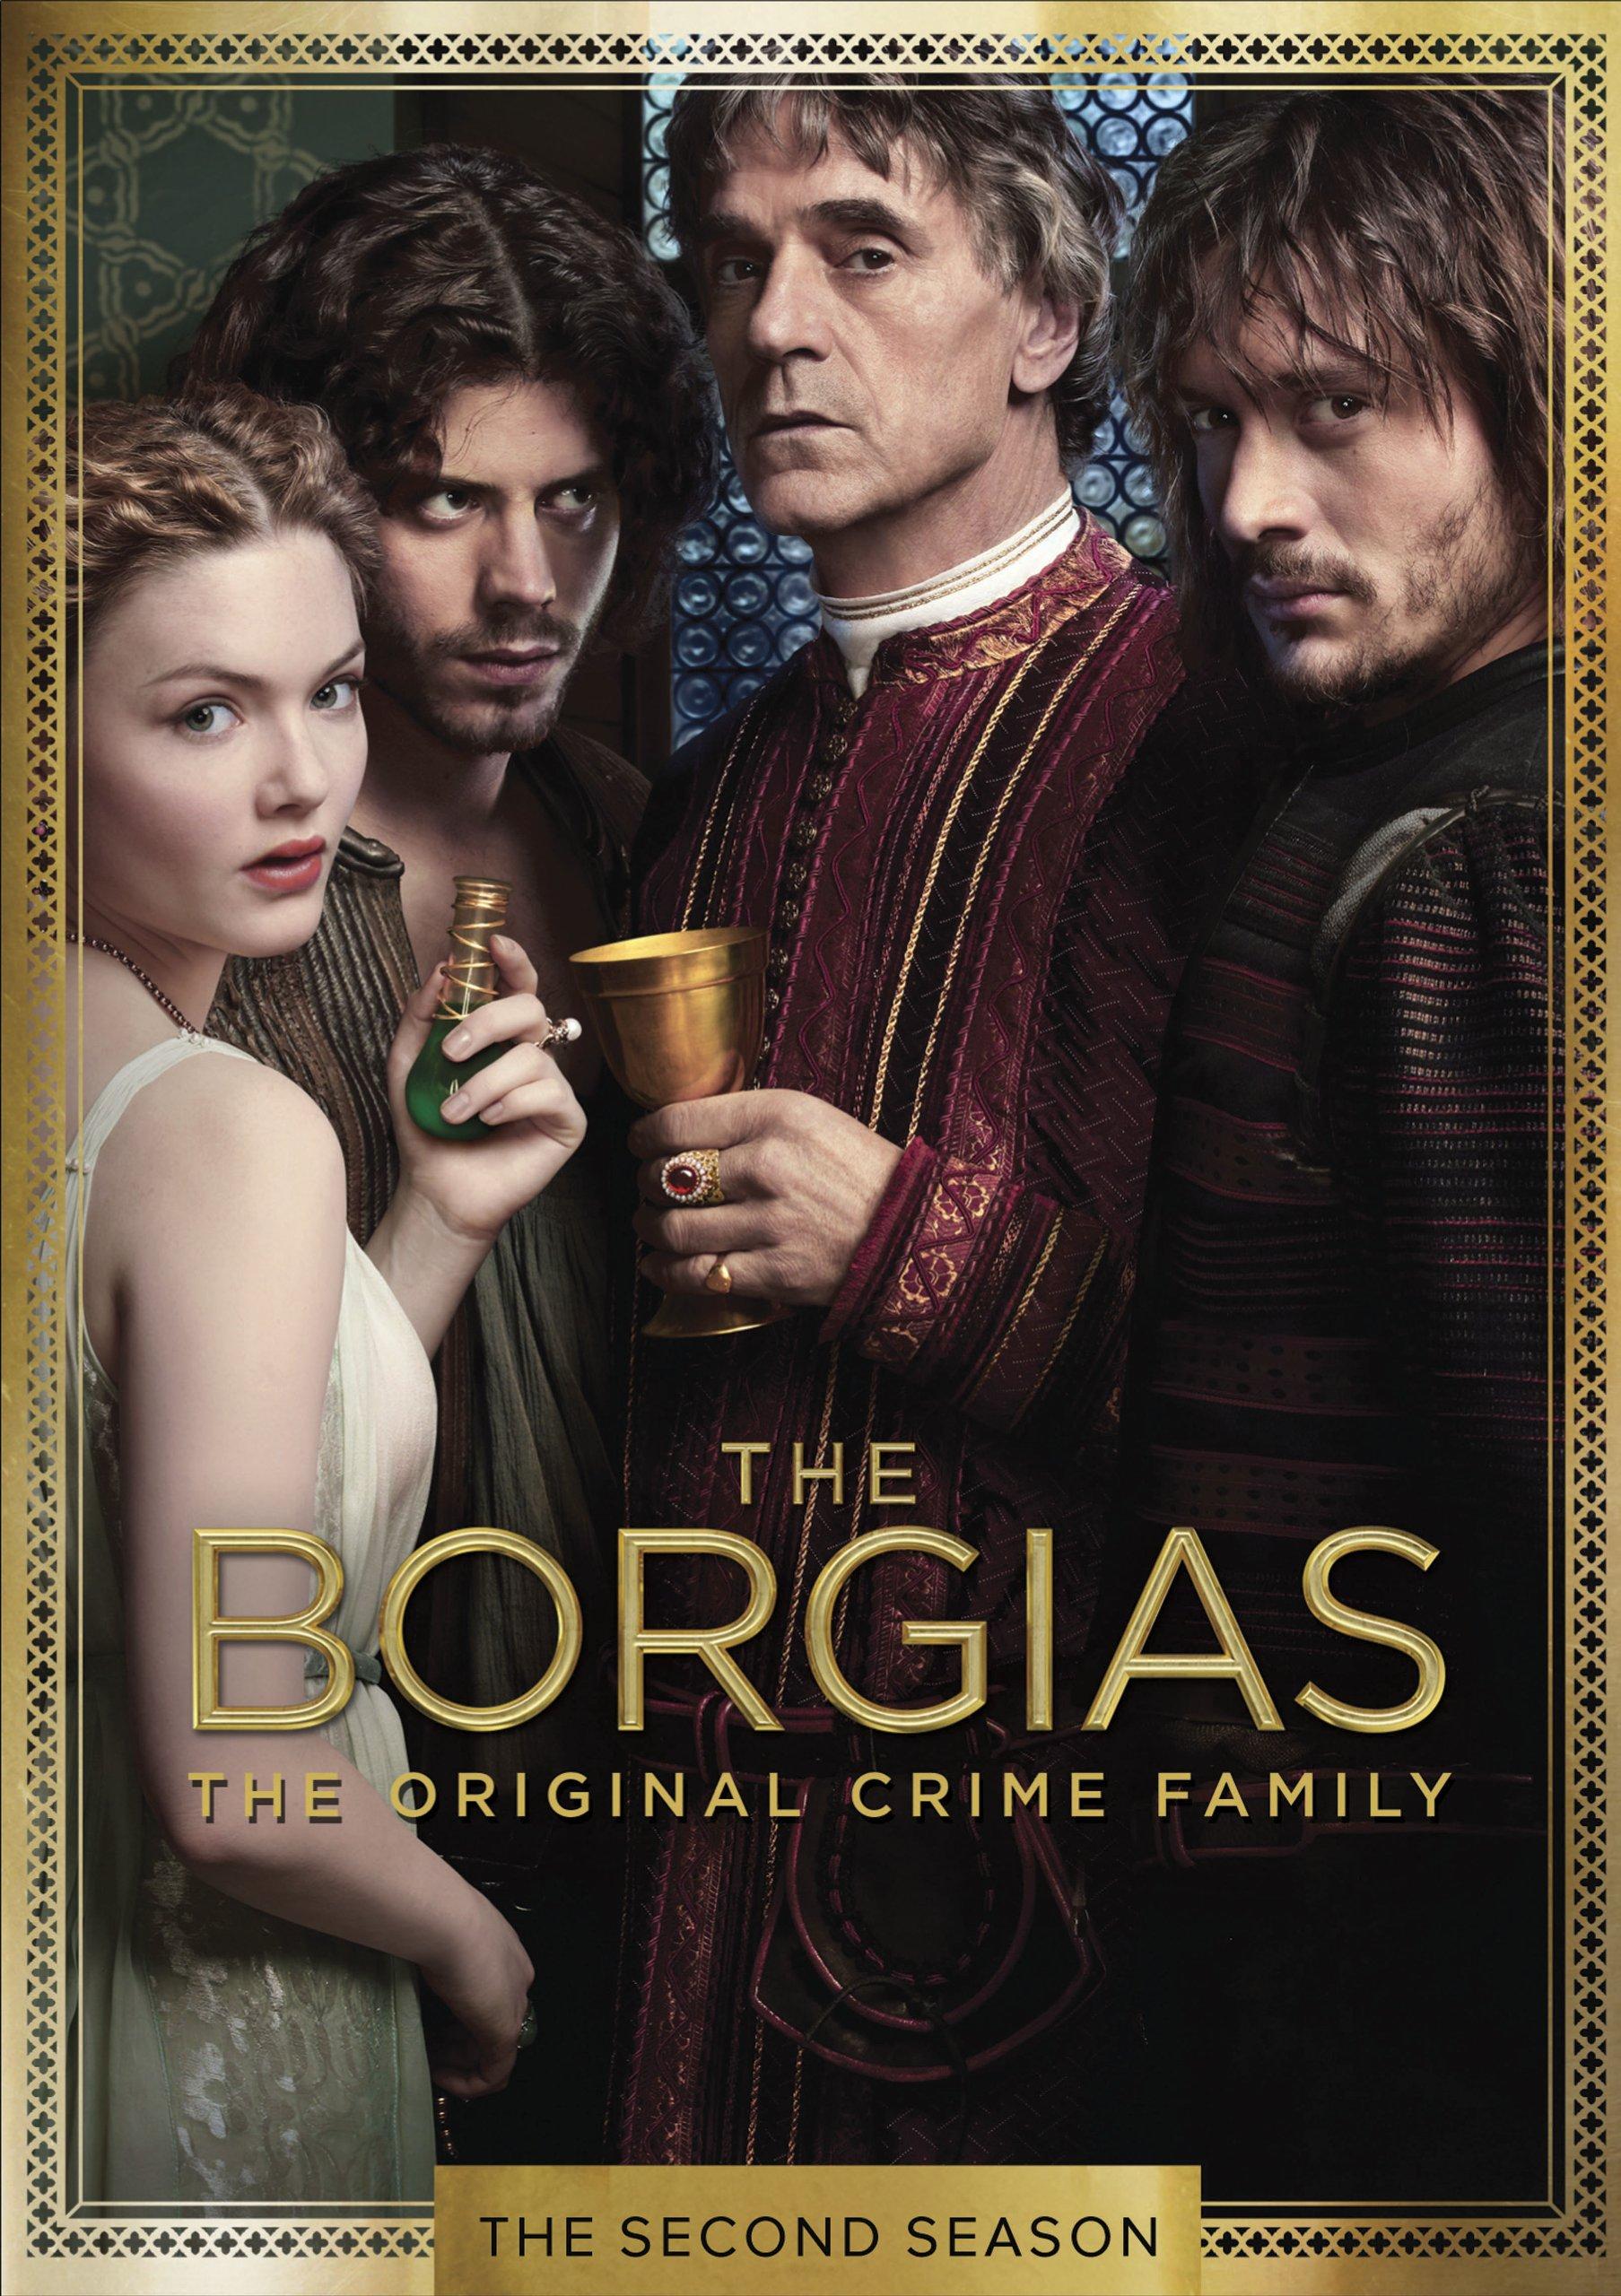 The Borgias DVD Release Date